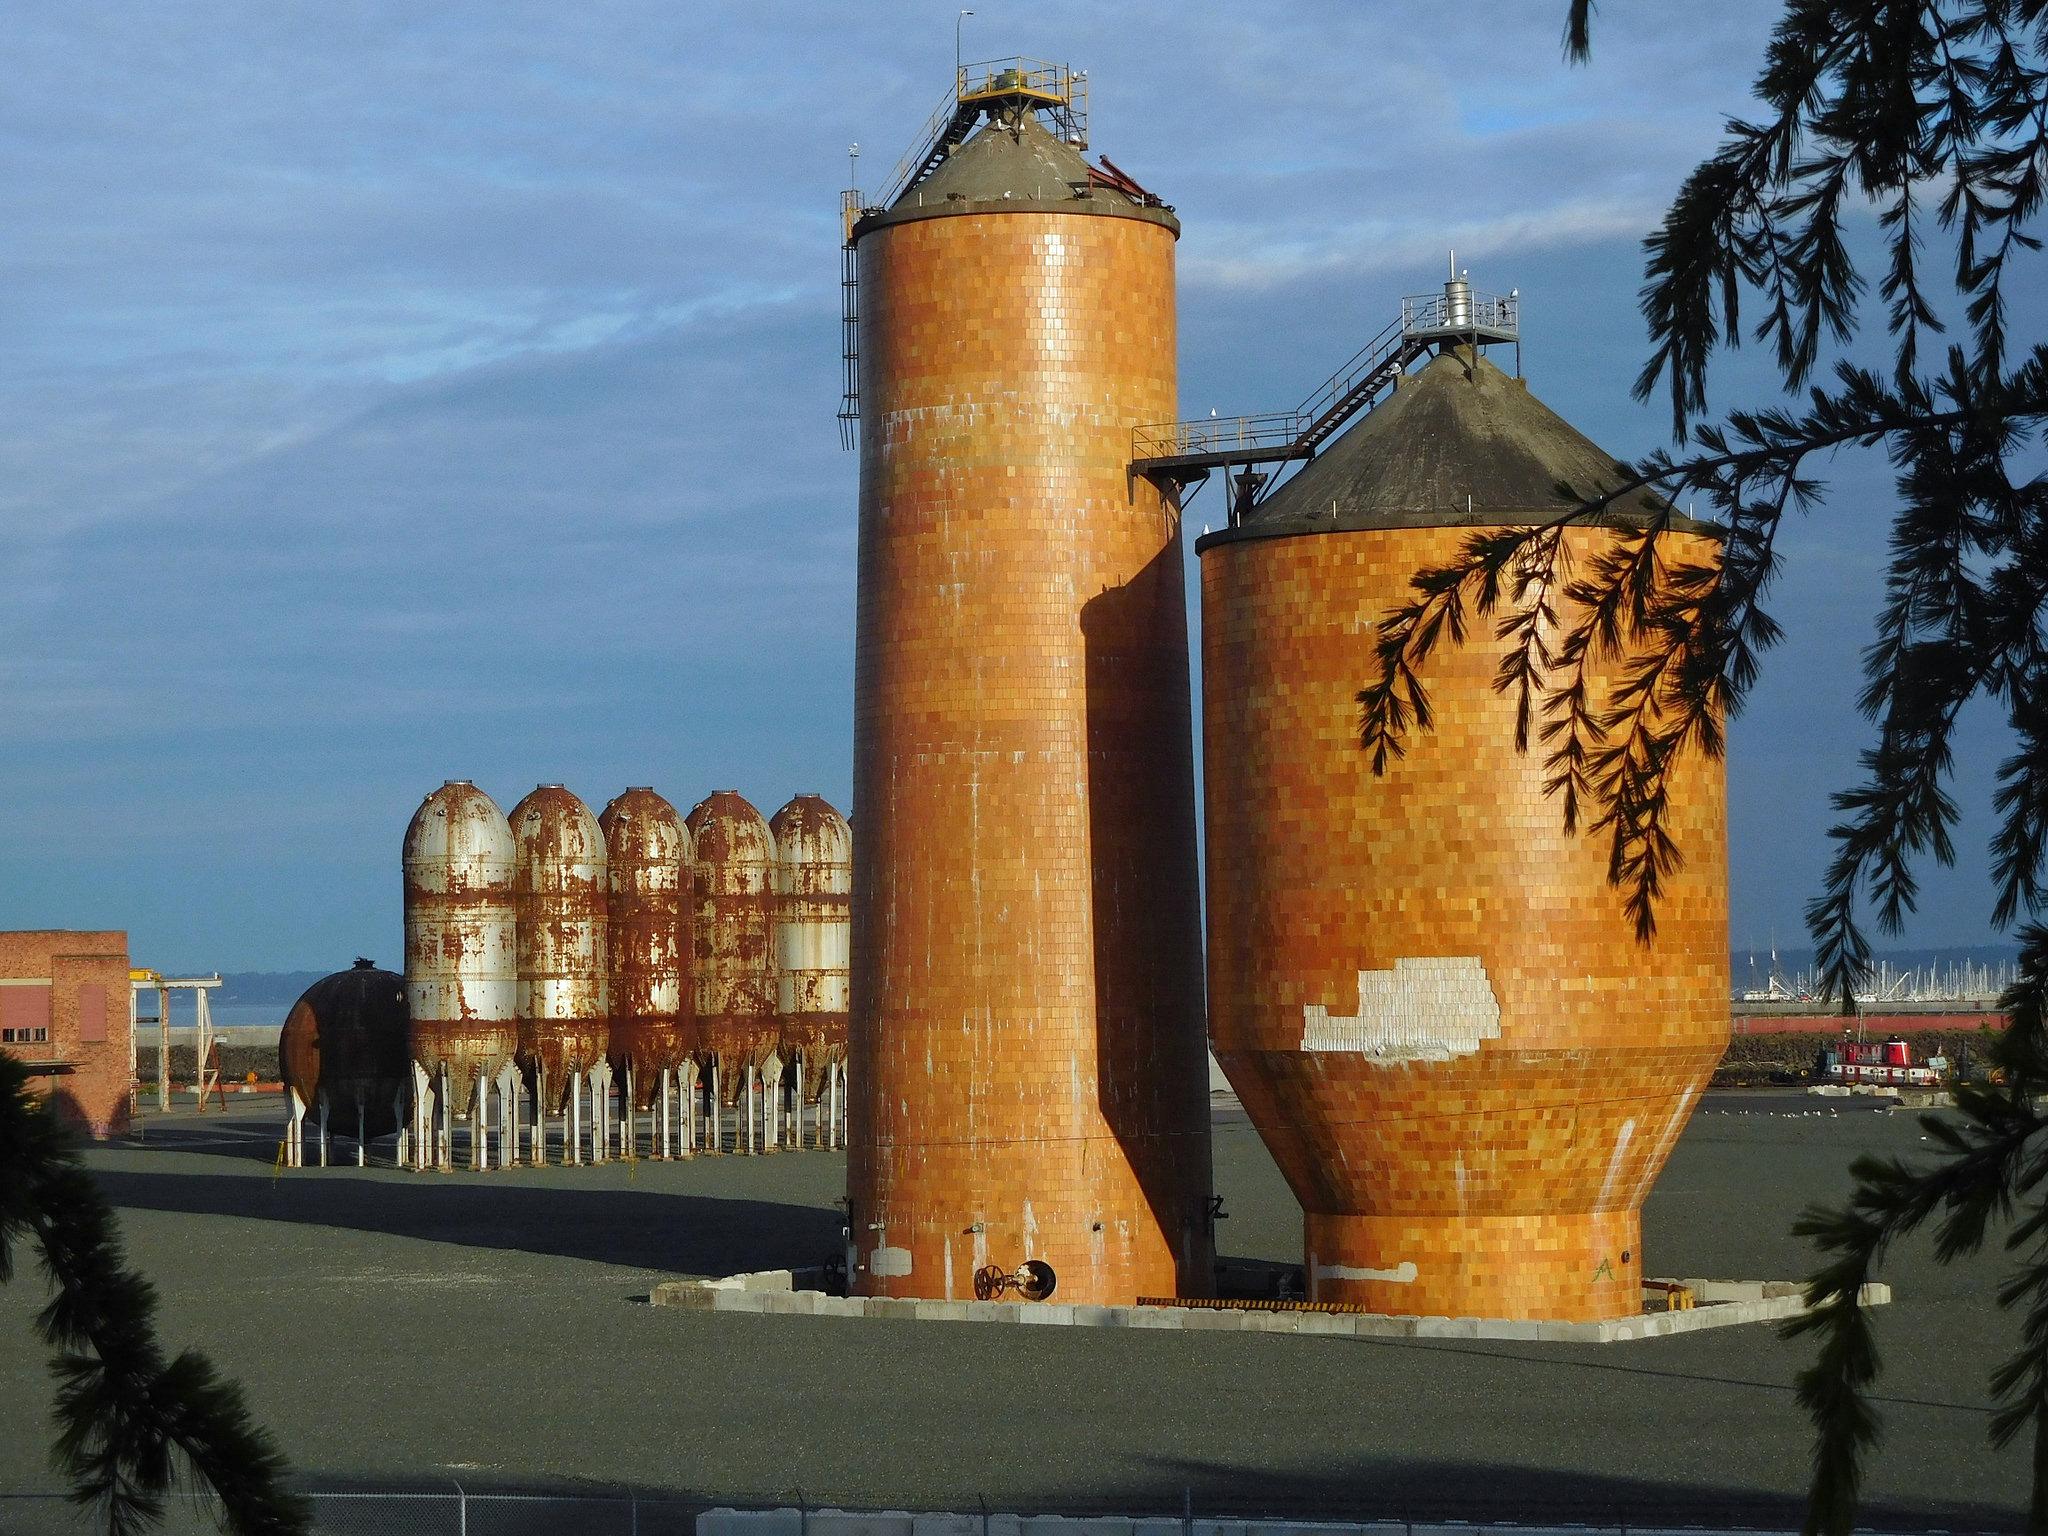 georgia pacific pulp mill.jpg